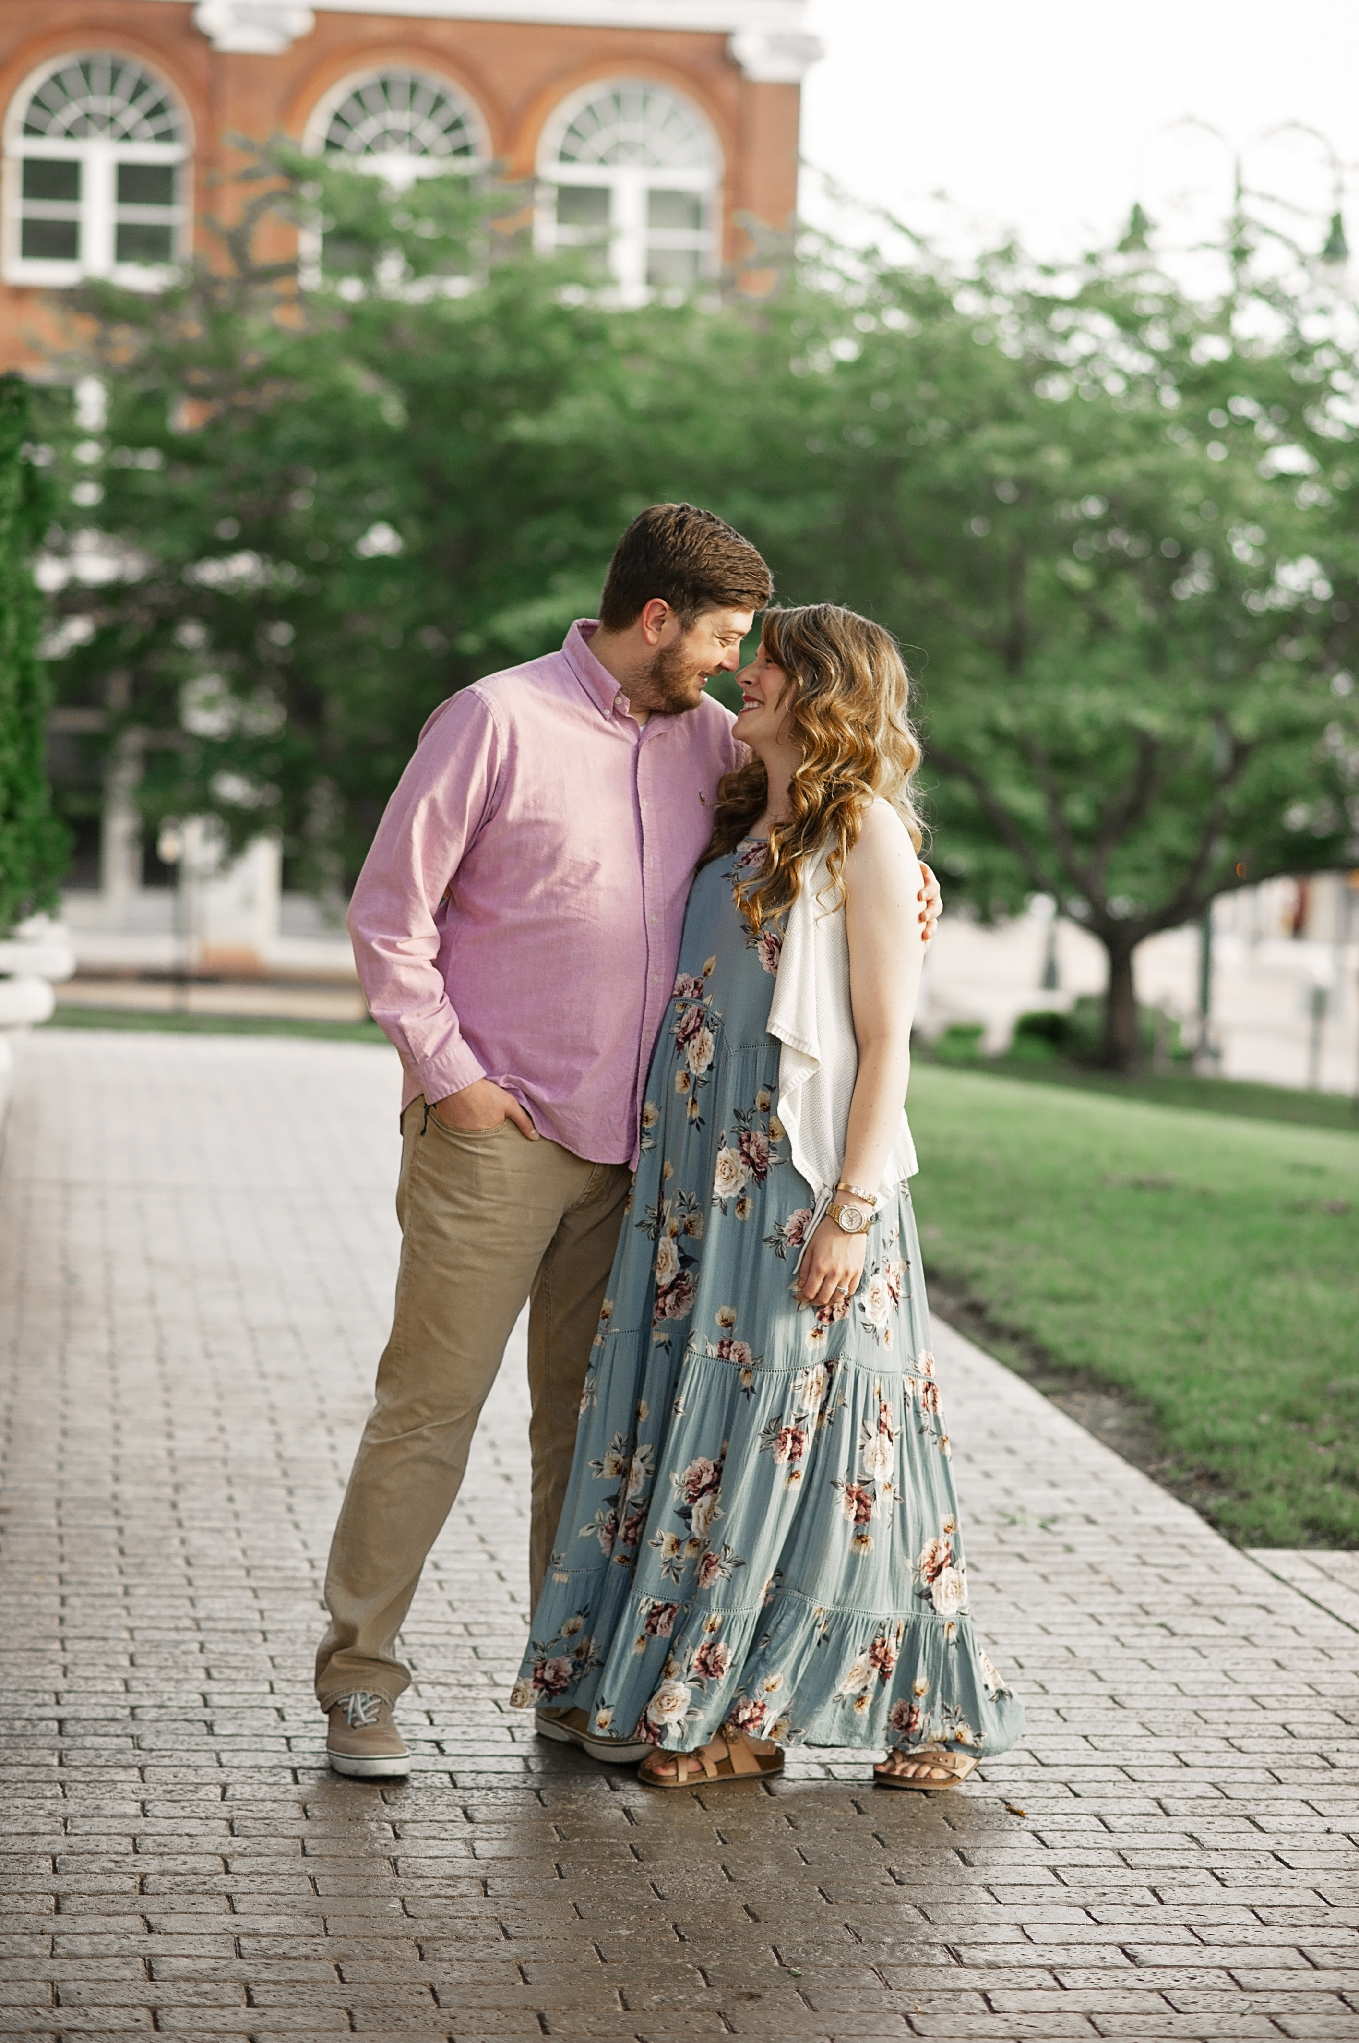 Stephanie Benge Photography | Jackson, TN Photographer